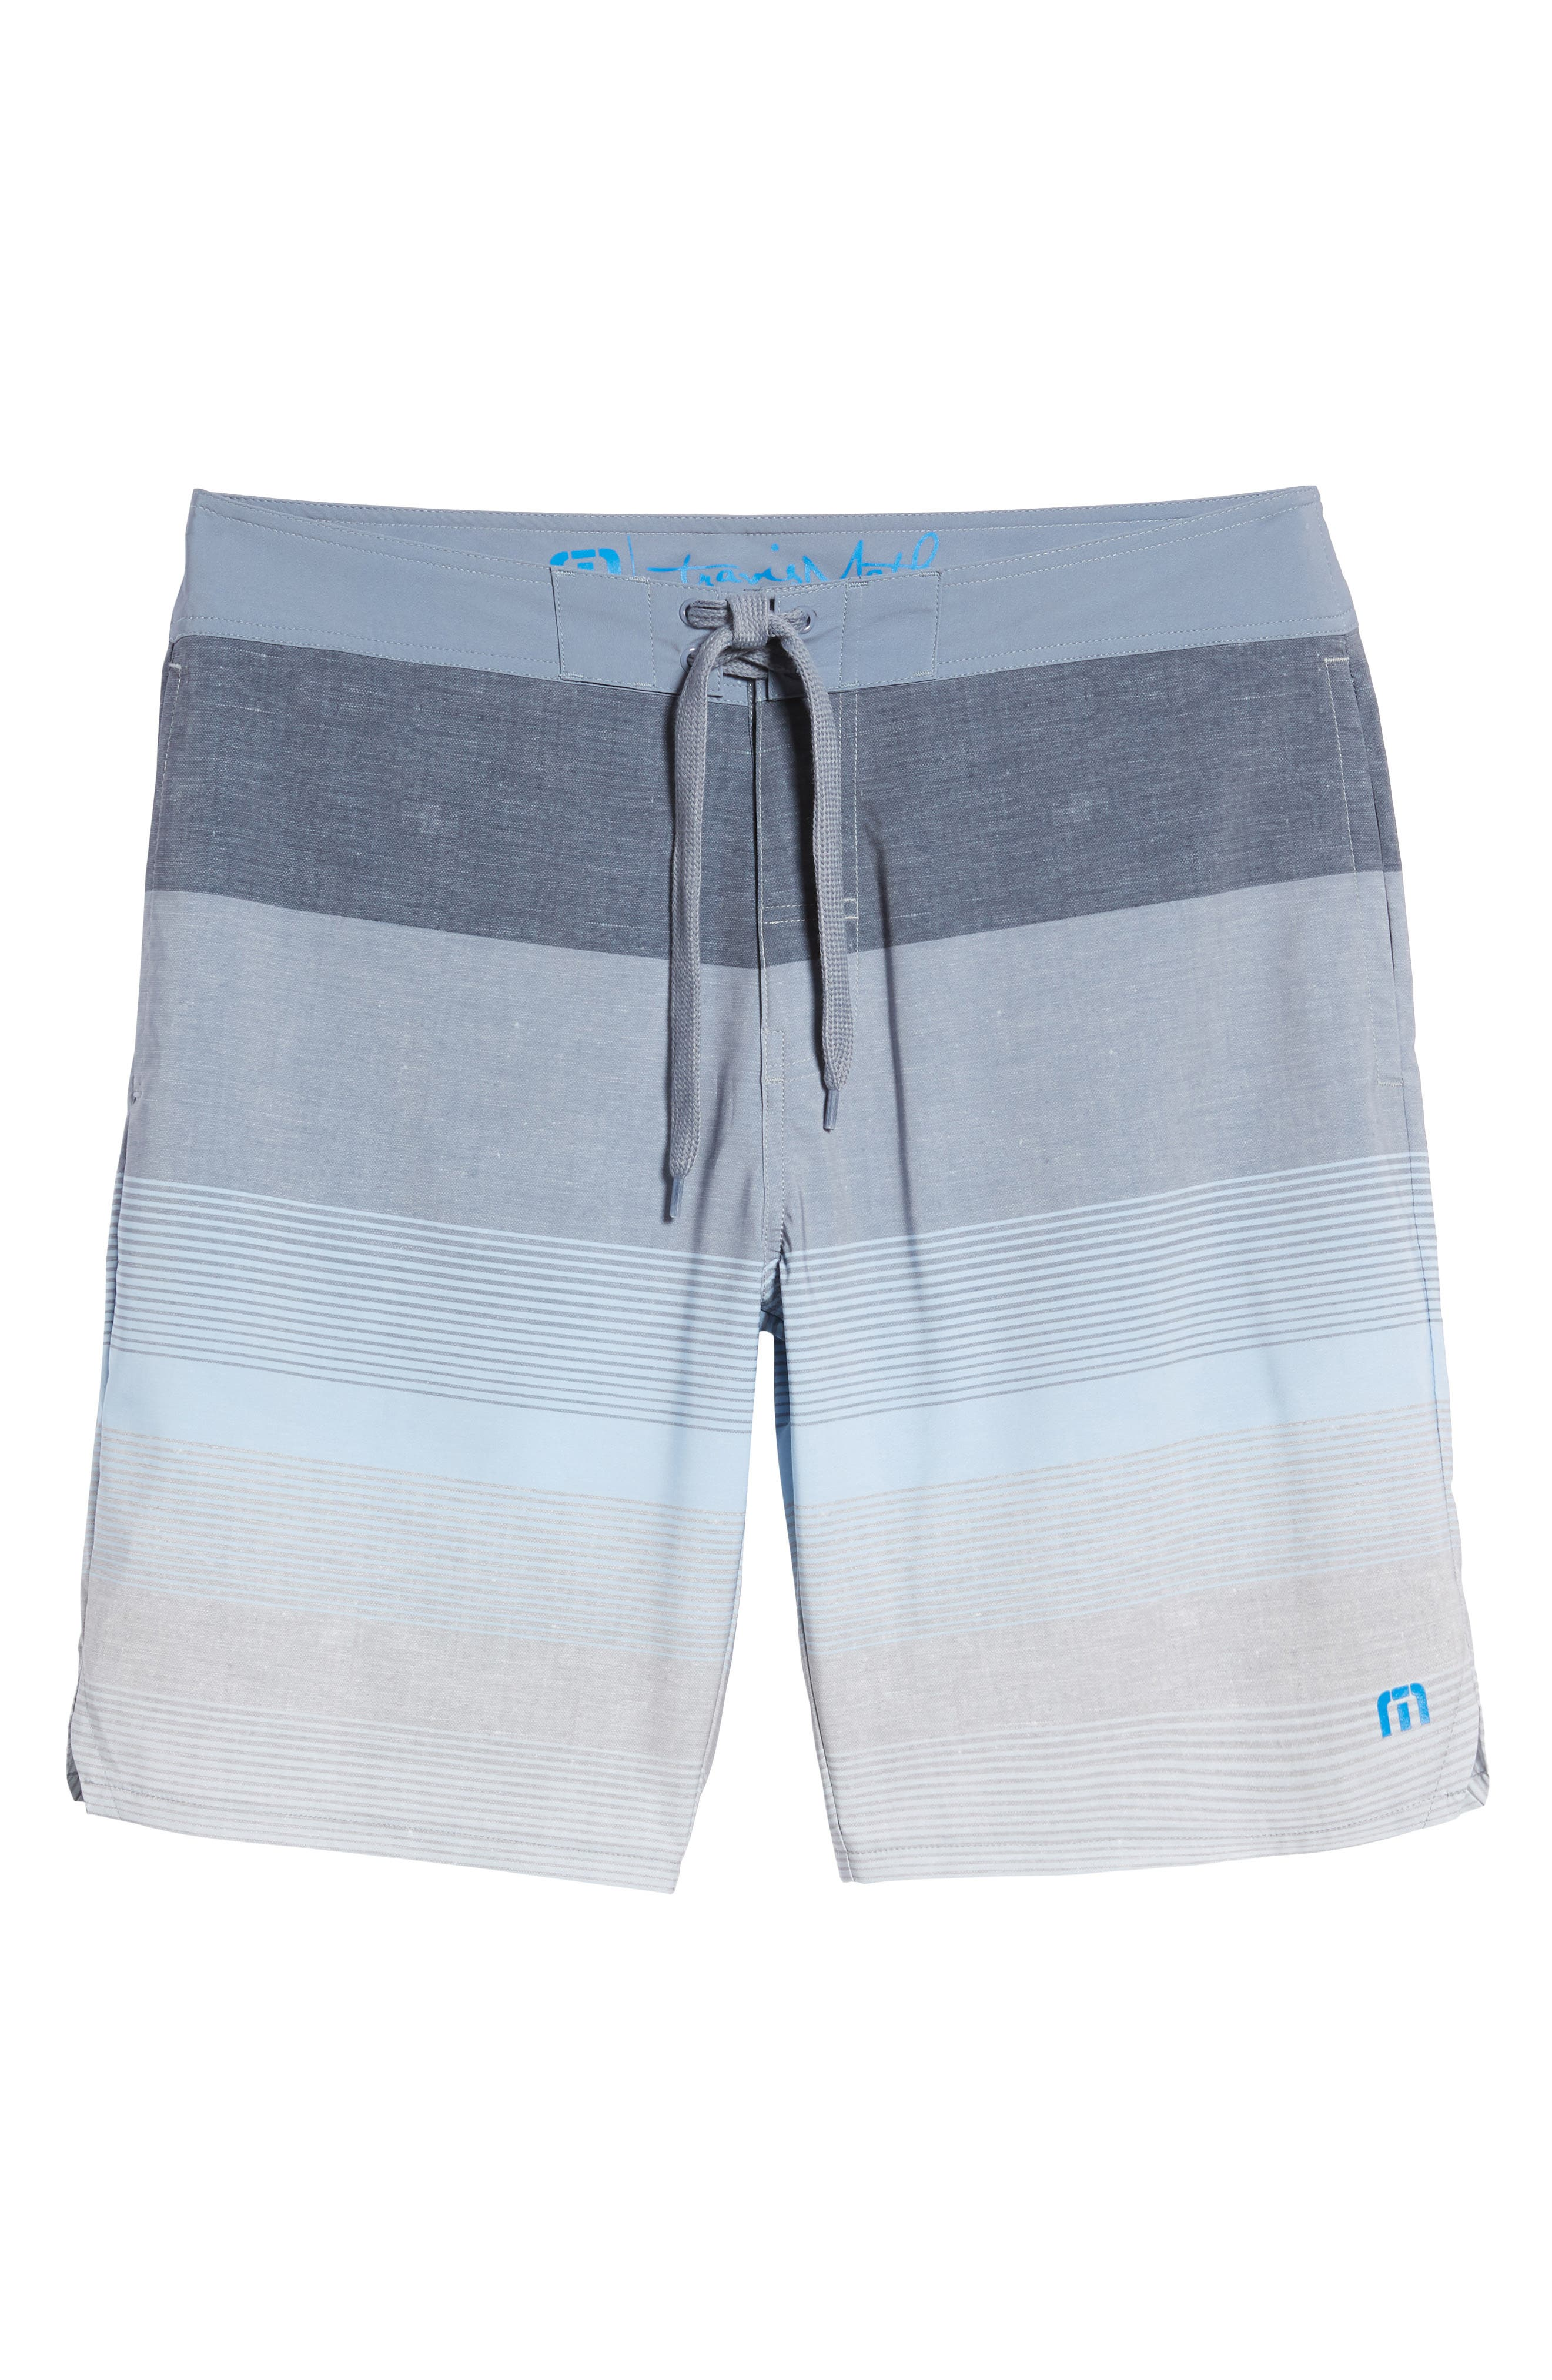 Seegrid Regular Fit Board Shorts,                             Alternate thumbnail 6, color,                             401